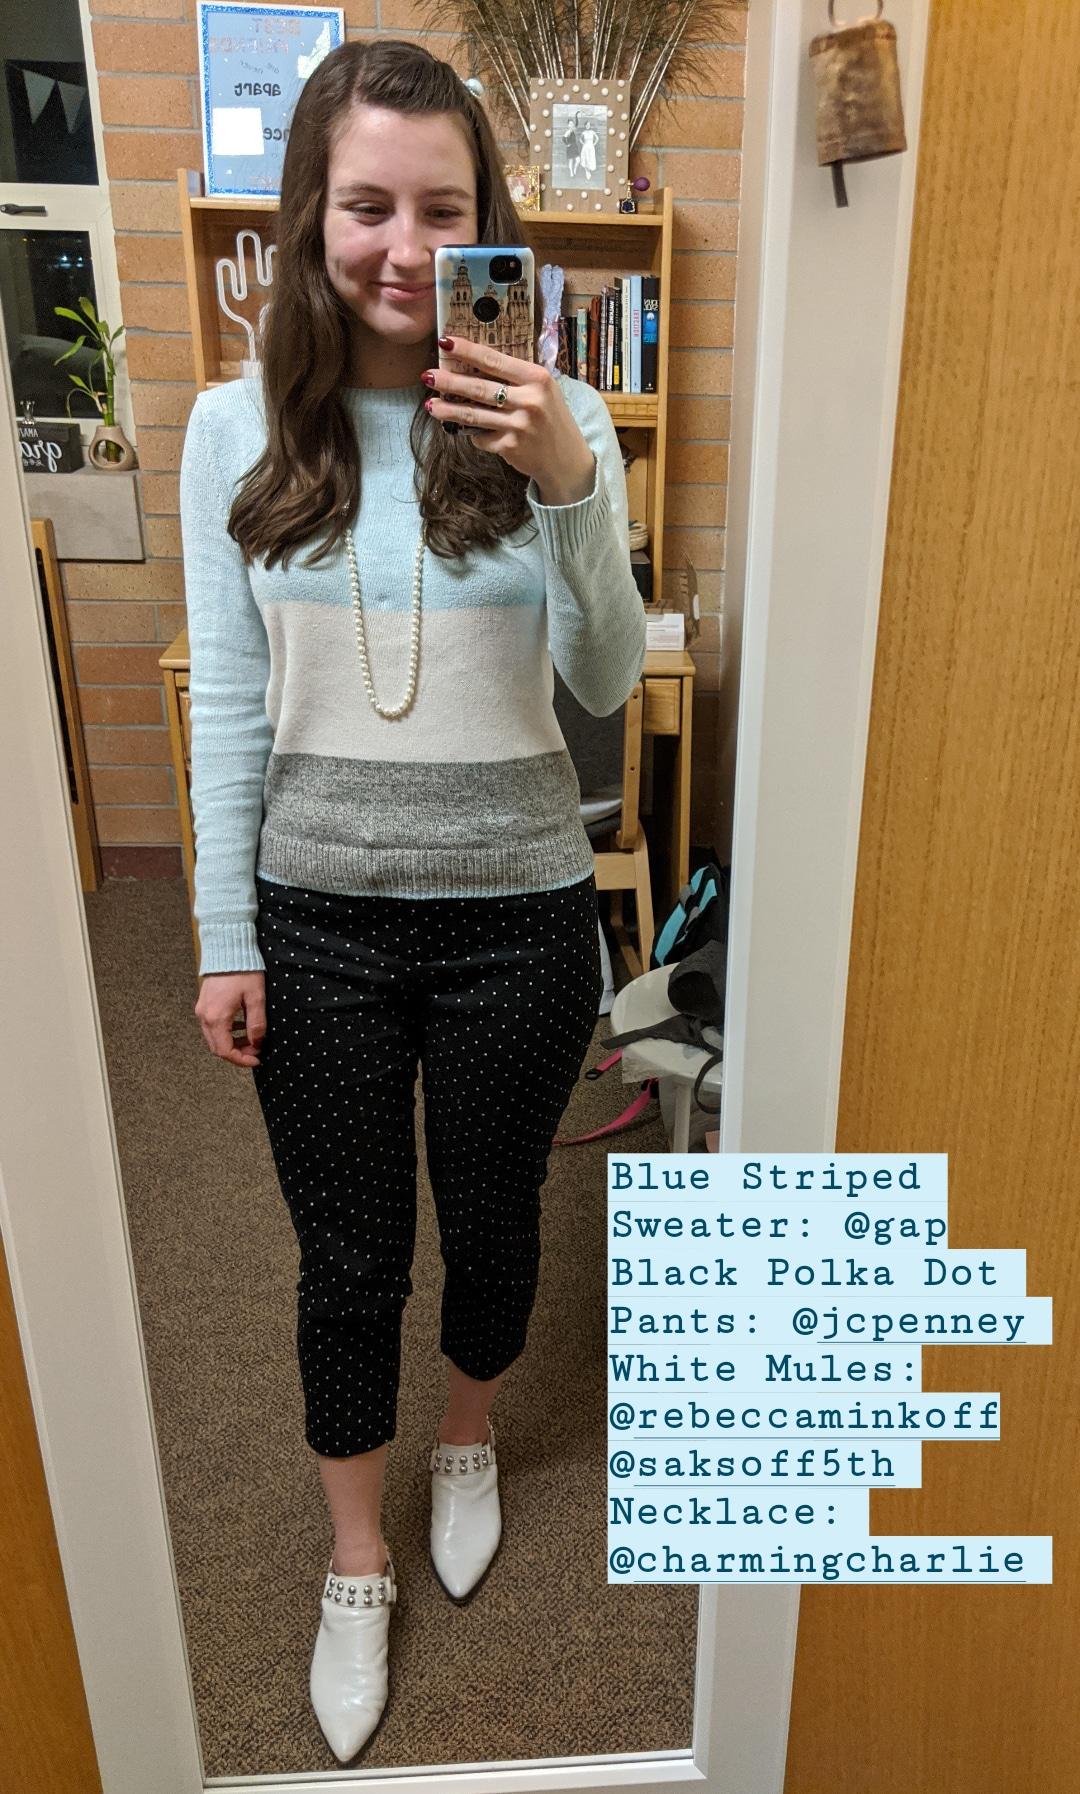 striped sweater, polka dot pants, white mules